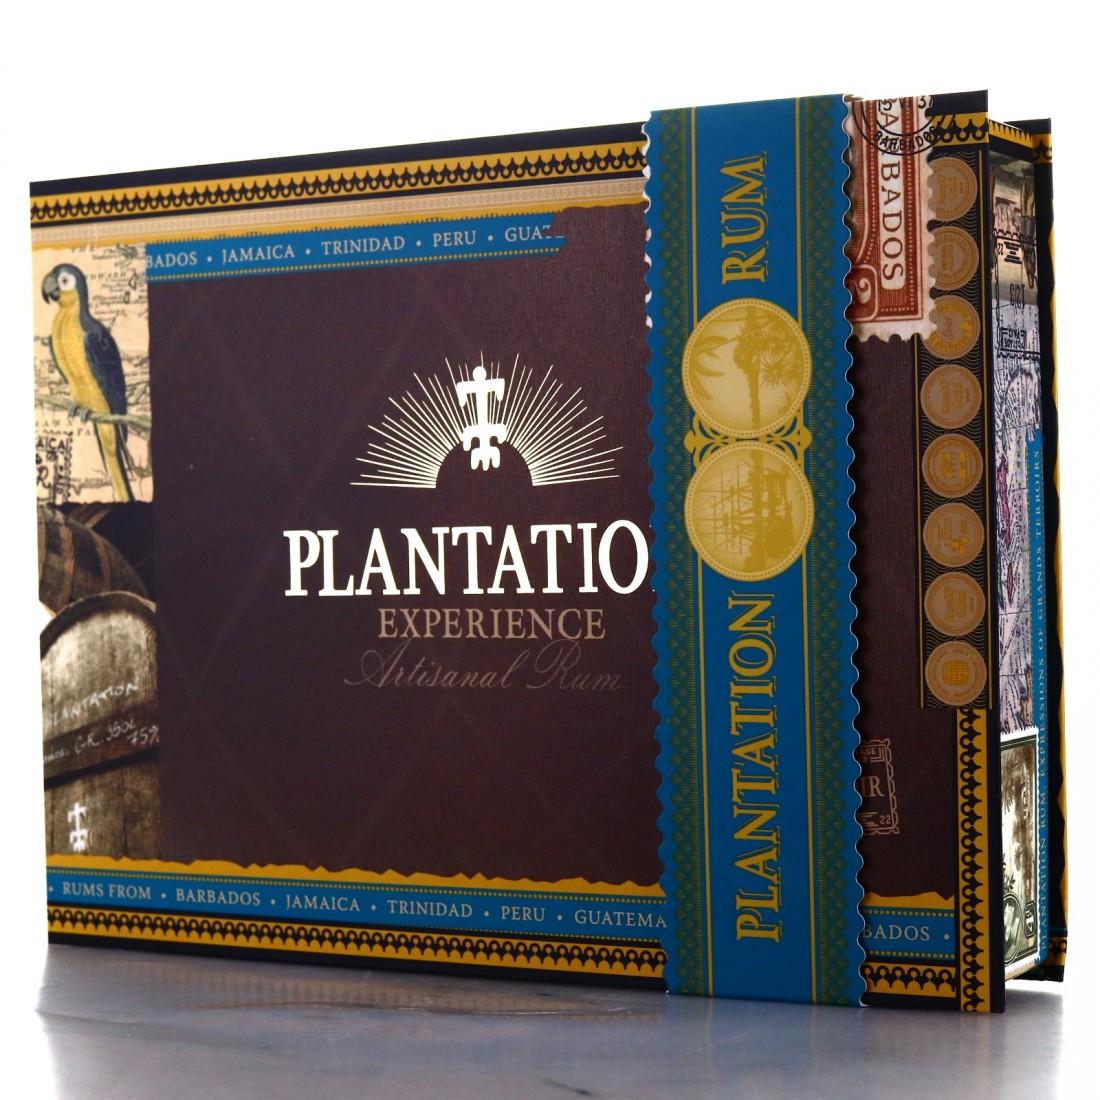 Plantation Grand Terroir Gift Pack 6 x 10cl